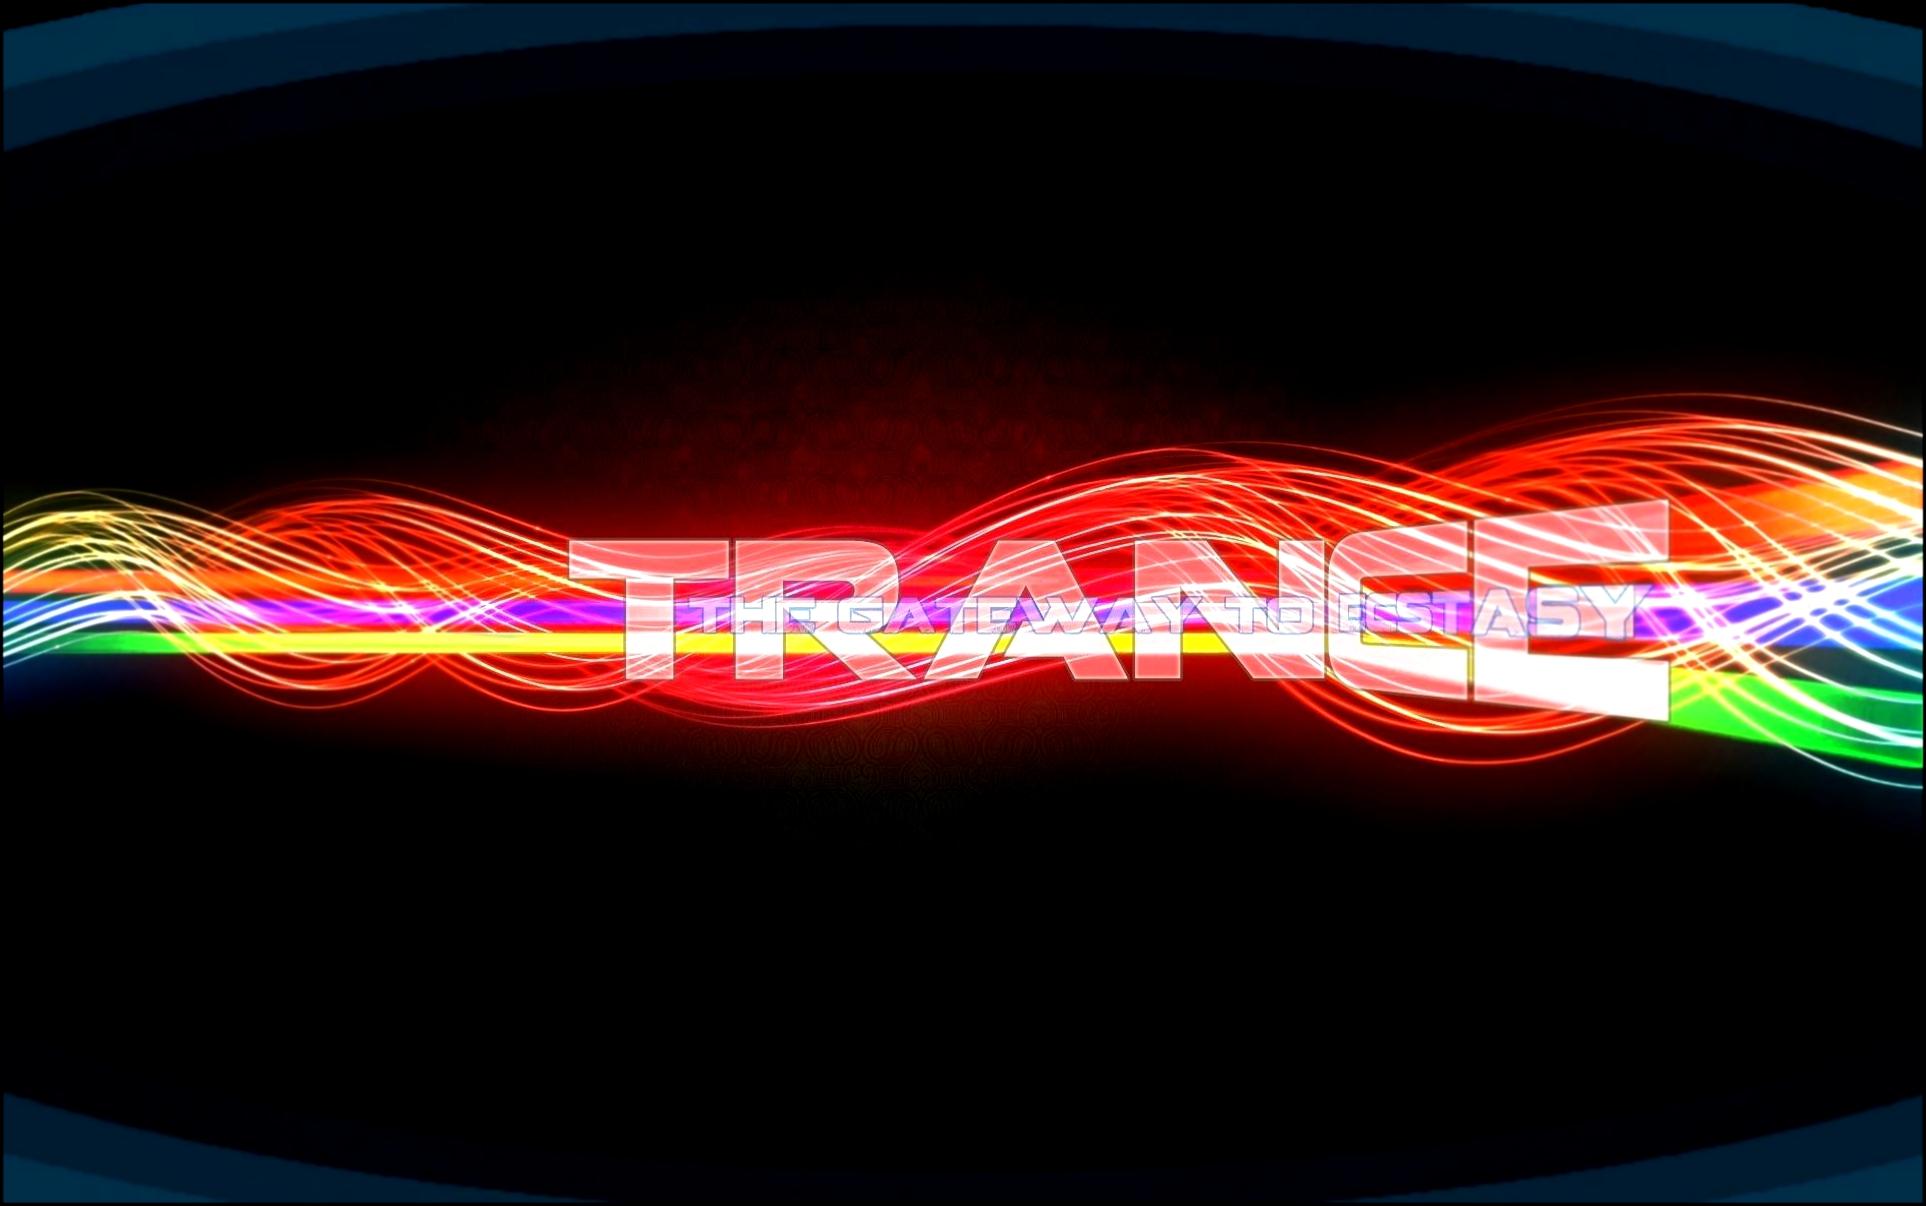 Trance Wallpaper HD - WallpaperSafari